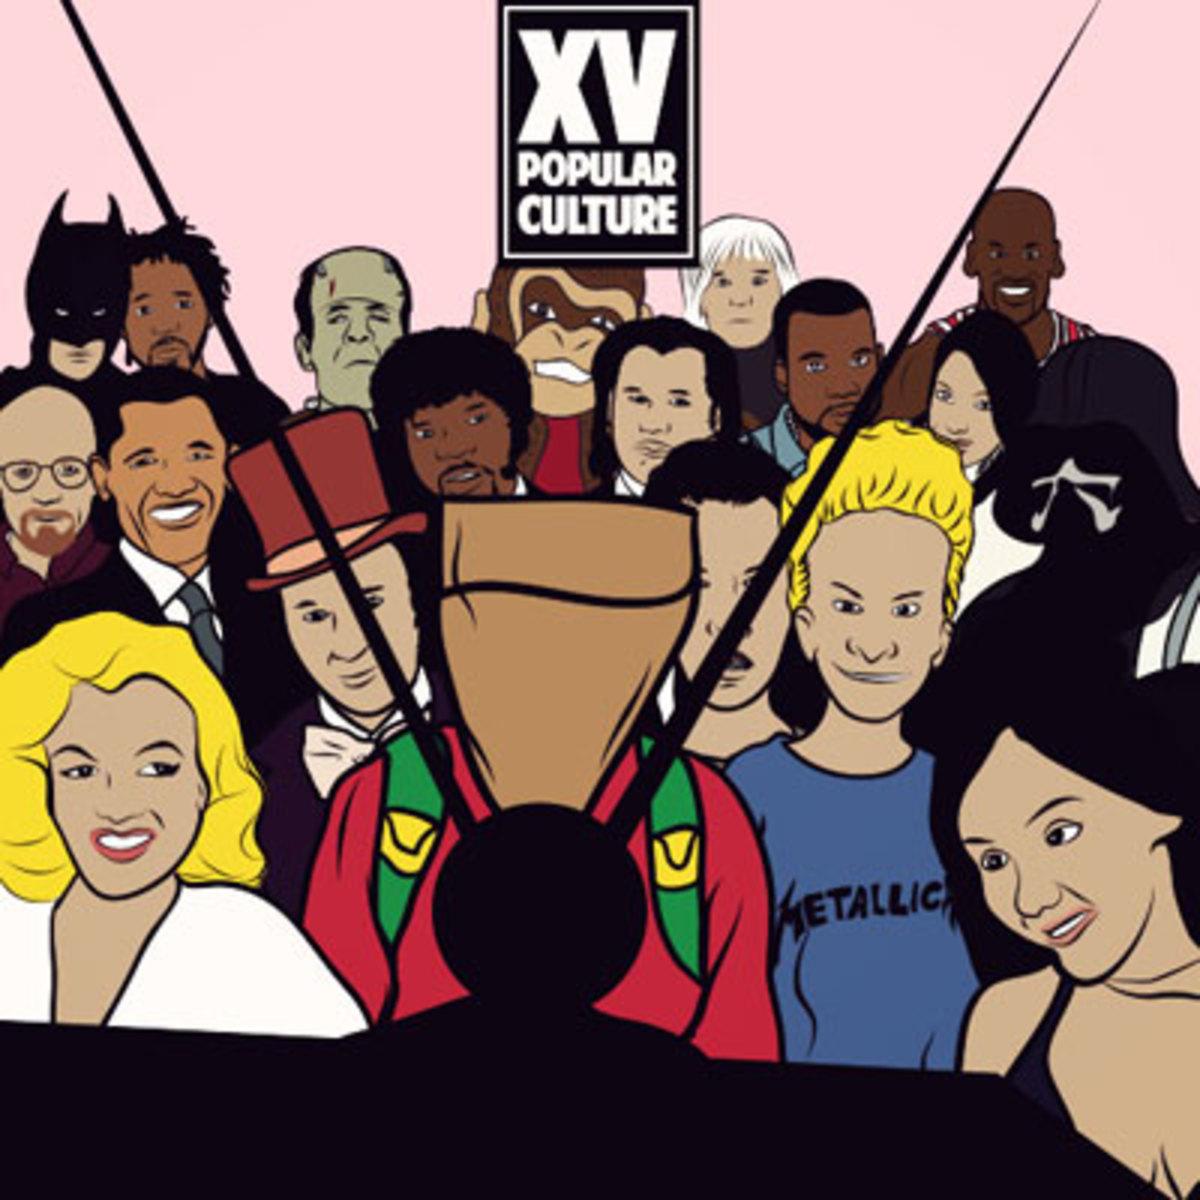 xv-popculturealt.jpg